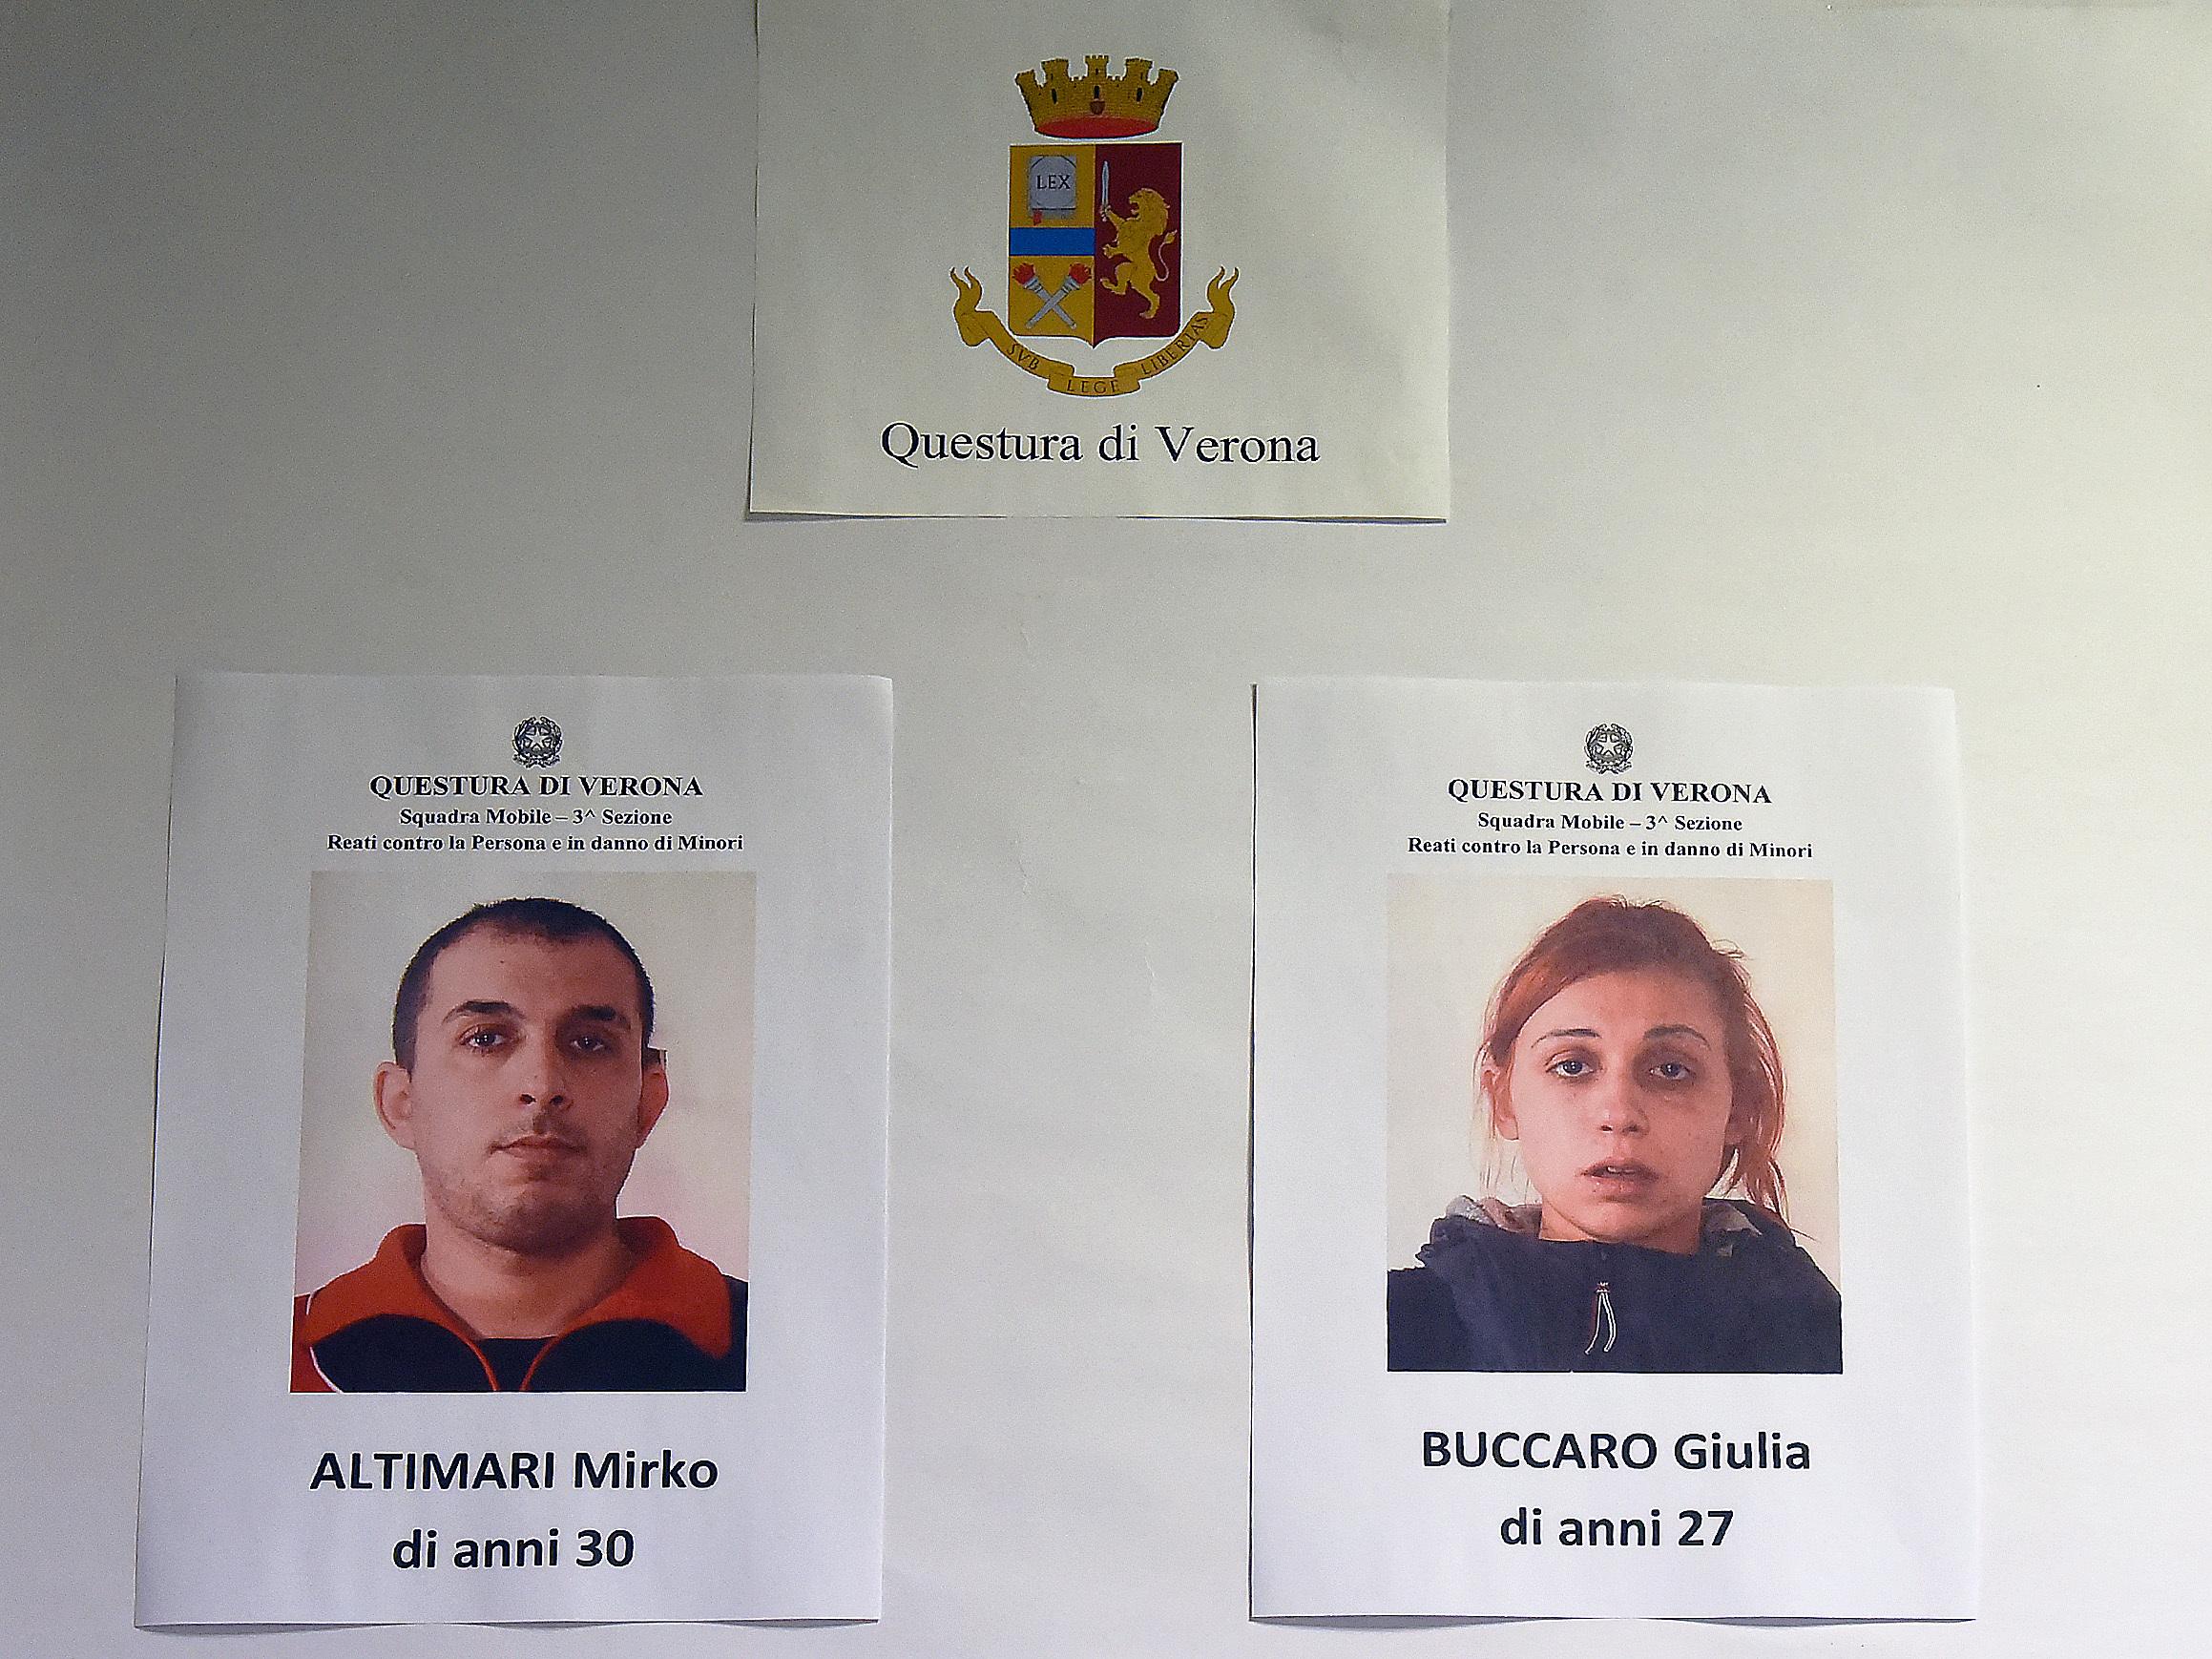 Altimari Mirko e Buccaro Giulia